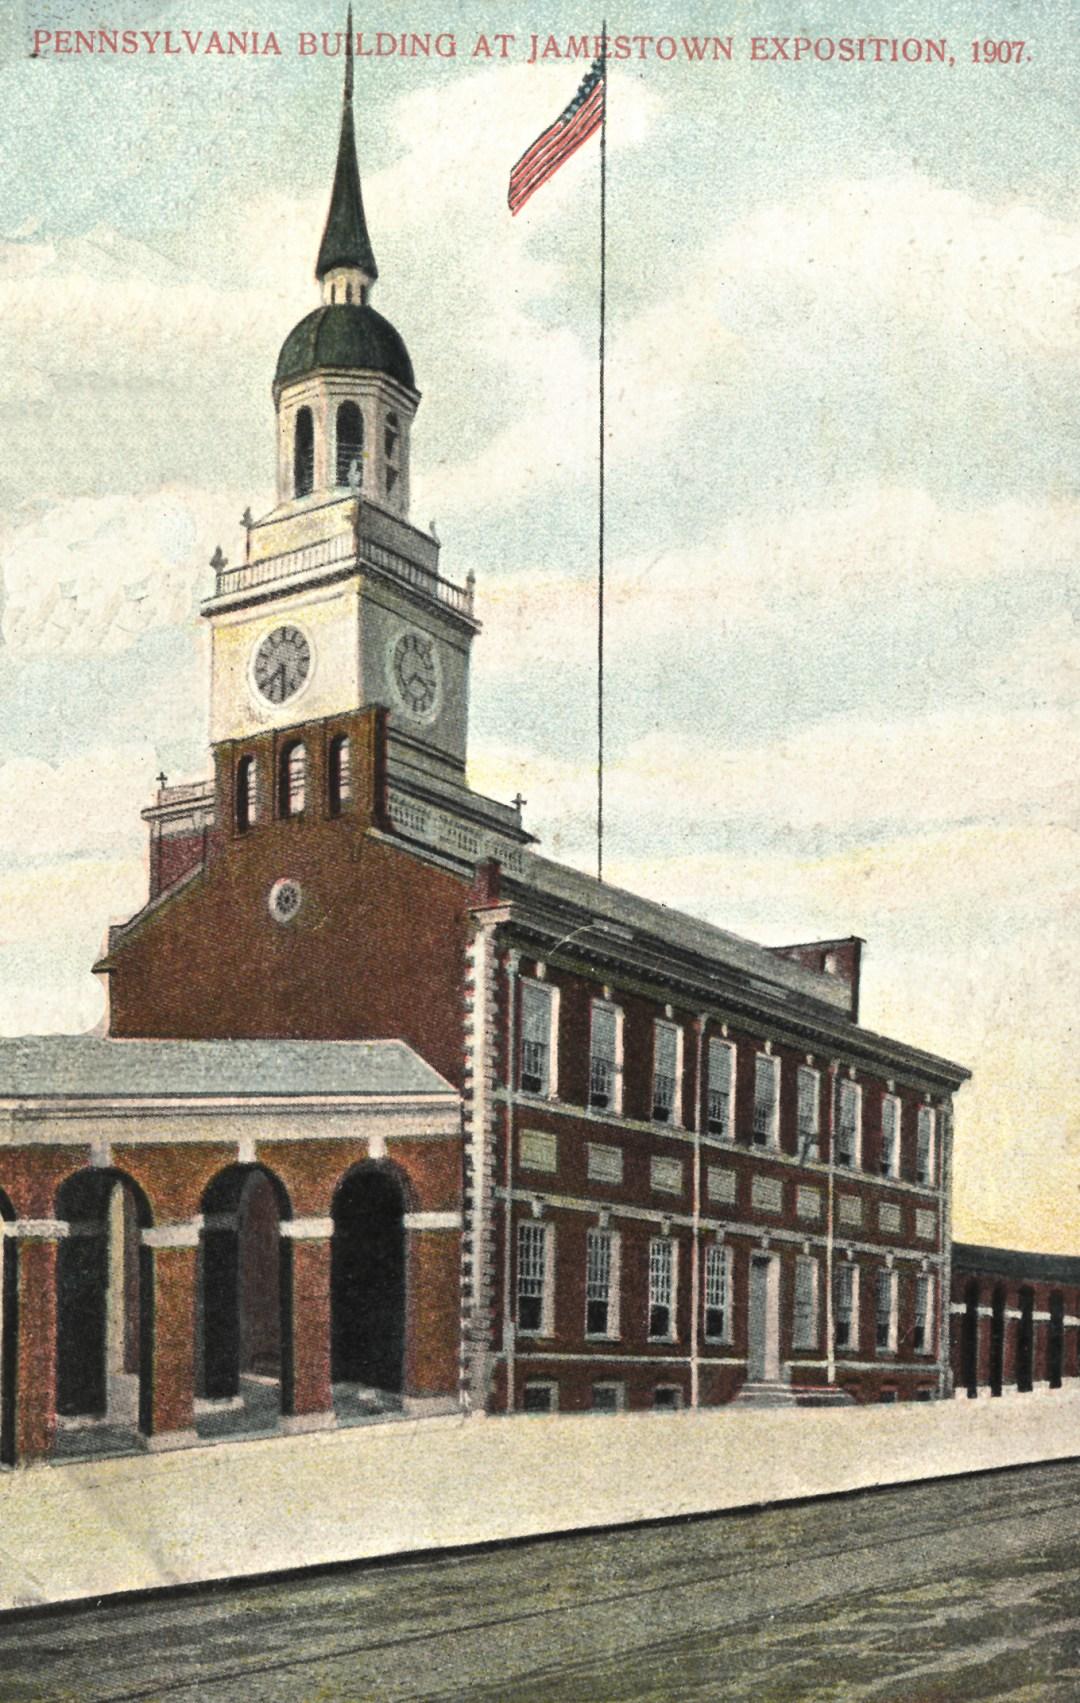 06PCJamestown Exposition00184 - Pennsylvania State bldg copy